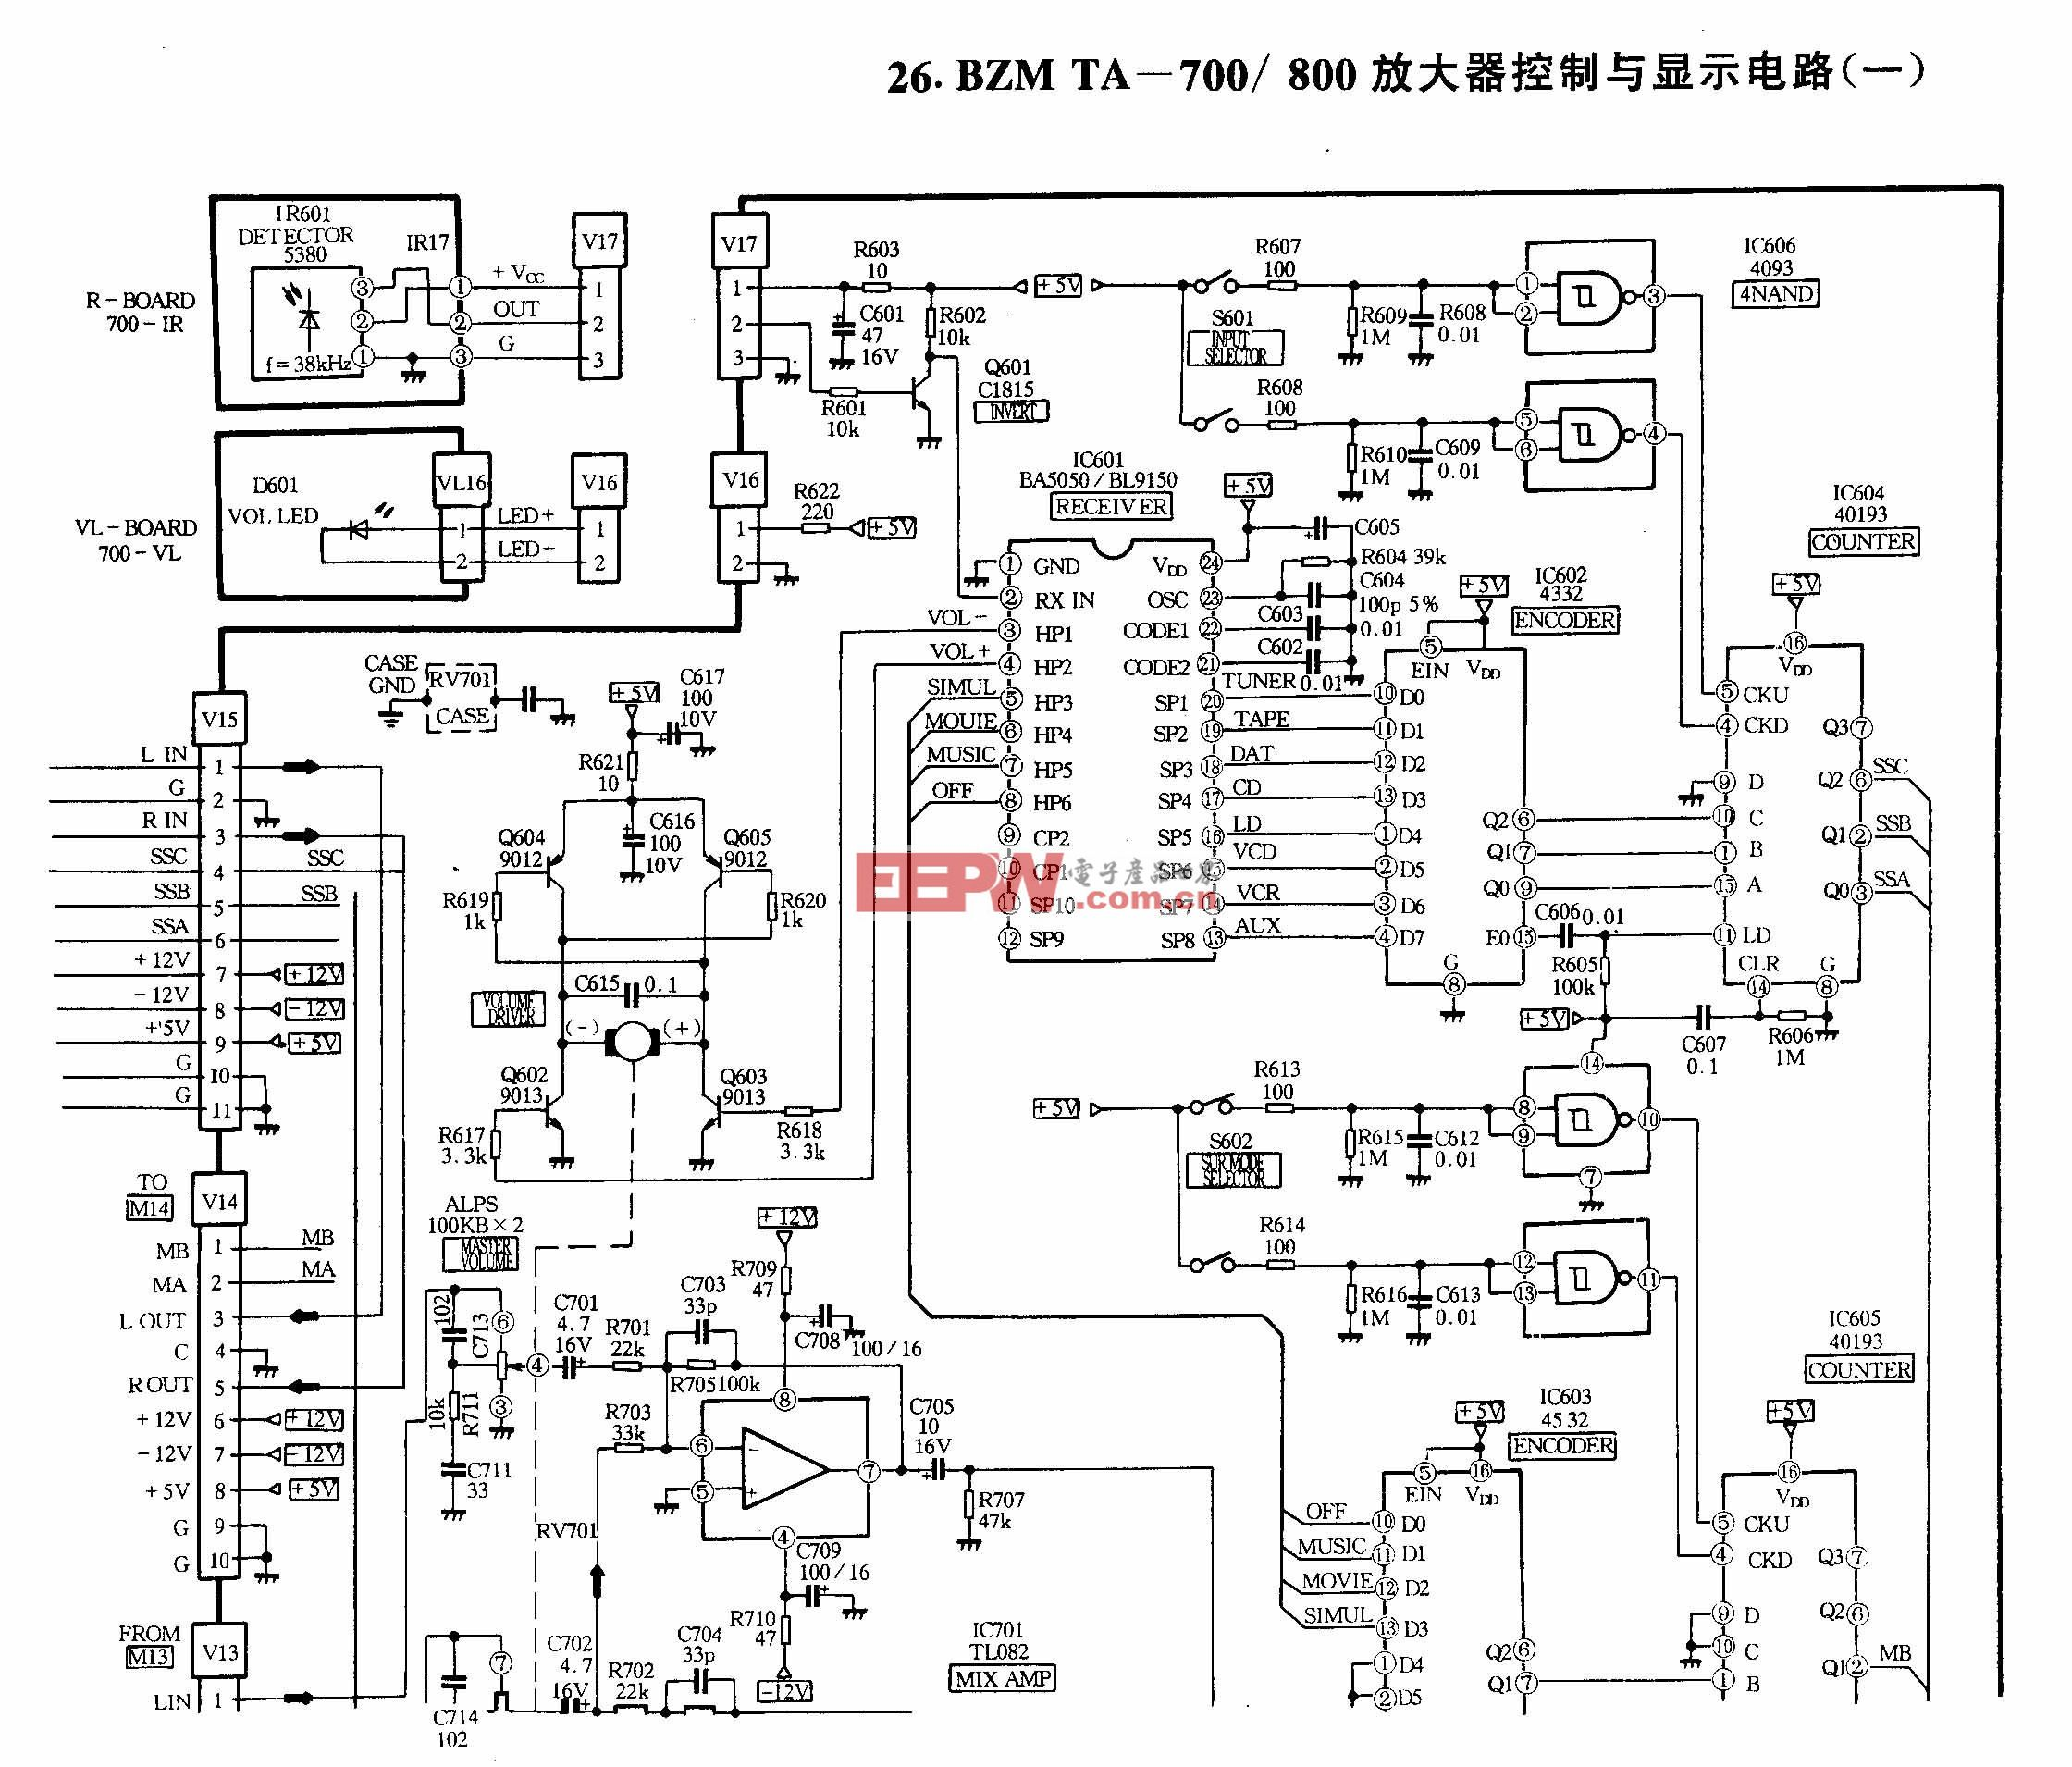 BZMTA-700/800放大器控制與顯示電路(一)